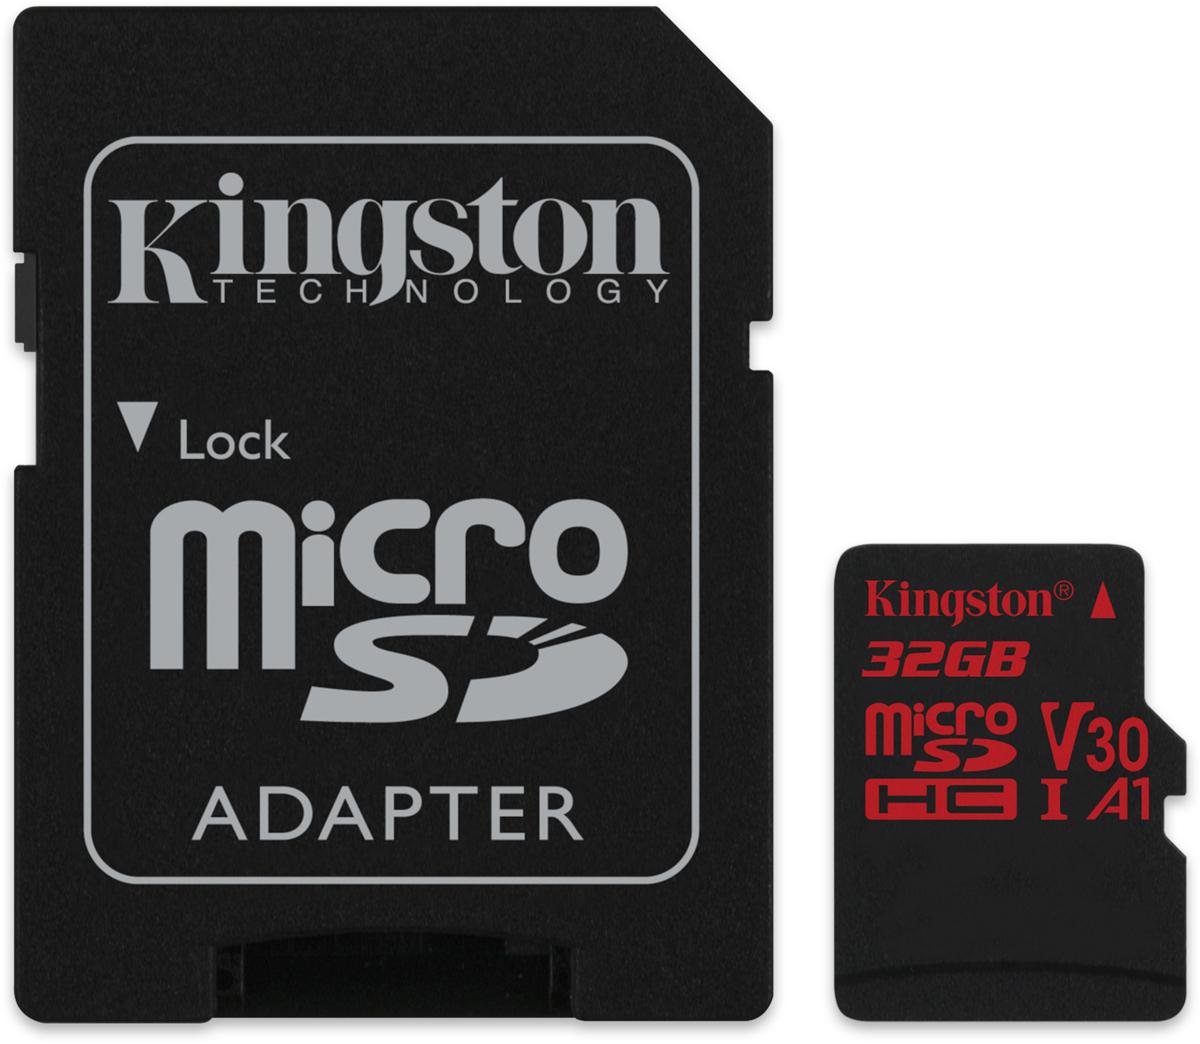 Kingston microSDHC Canvas React UHS-I Class U3 32GB карта памяти с адаптером карта памяти это внешняя или внутренняя